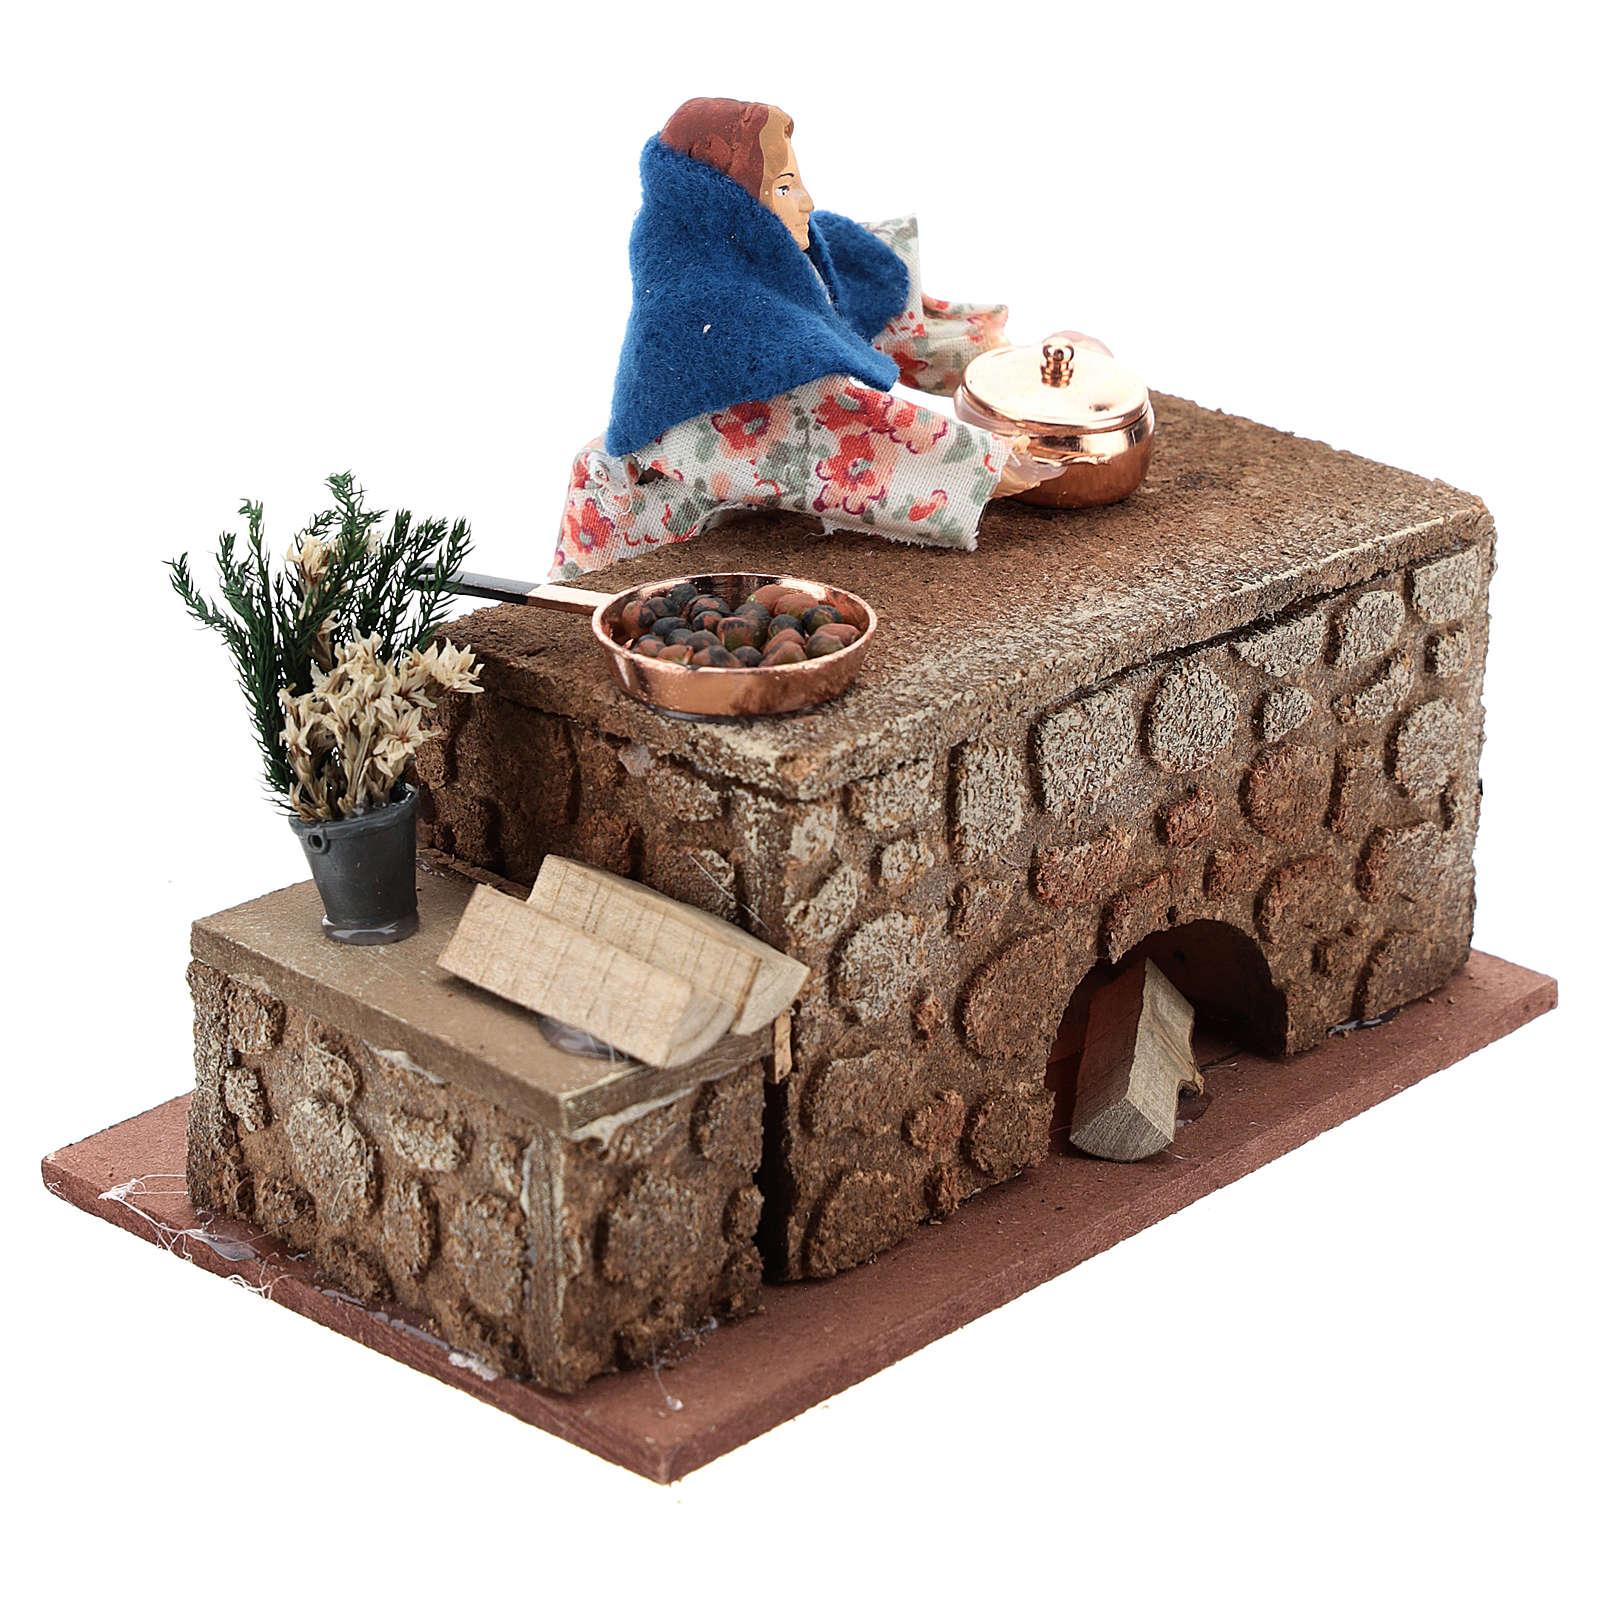 Moving cook 12 cm for Nativity scene 3